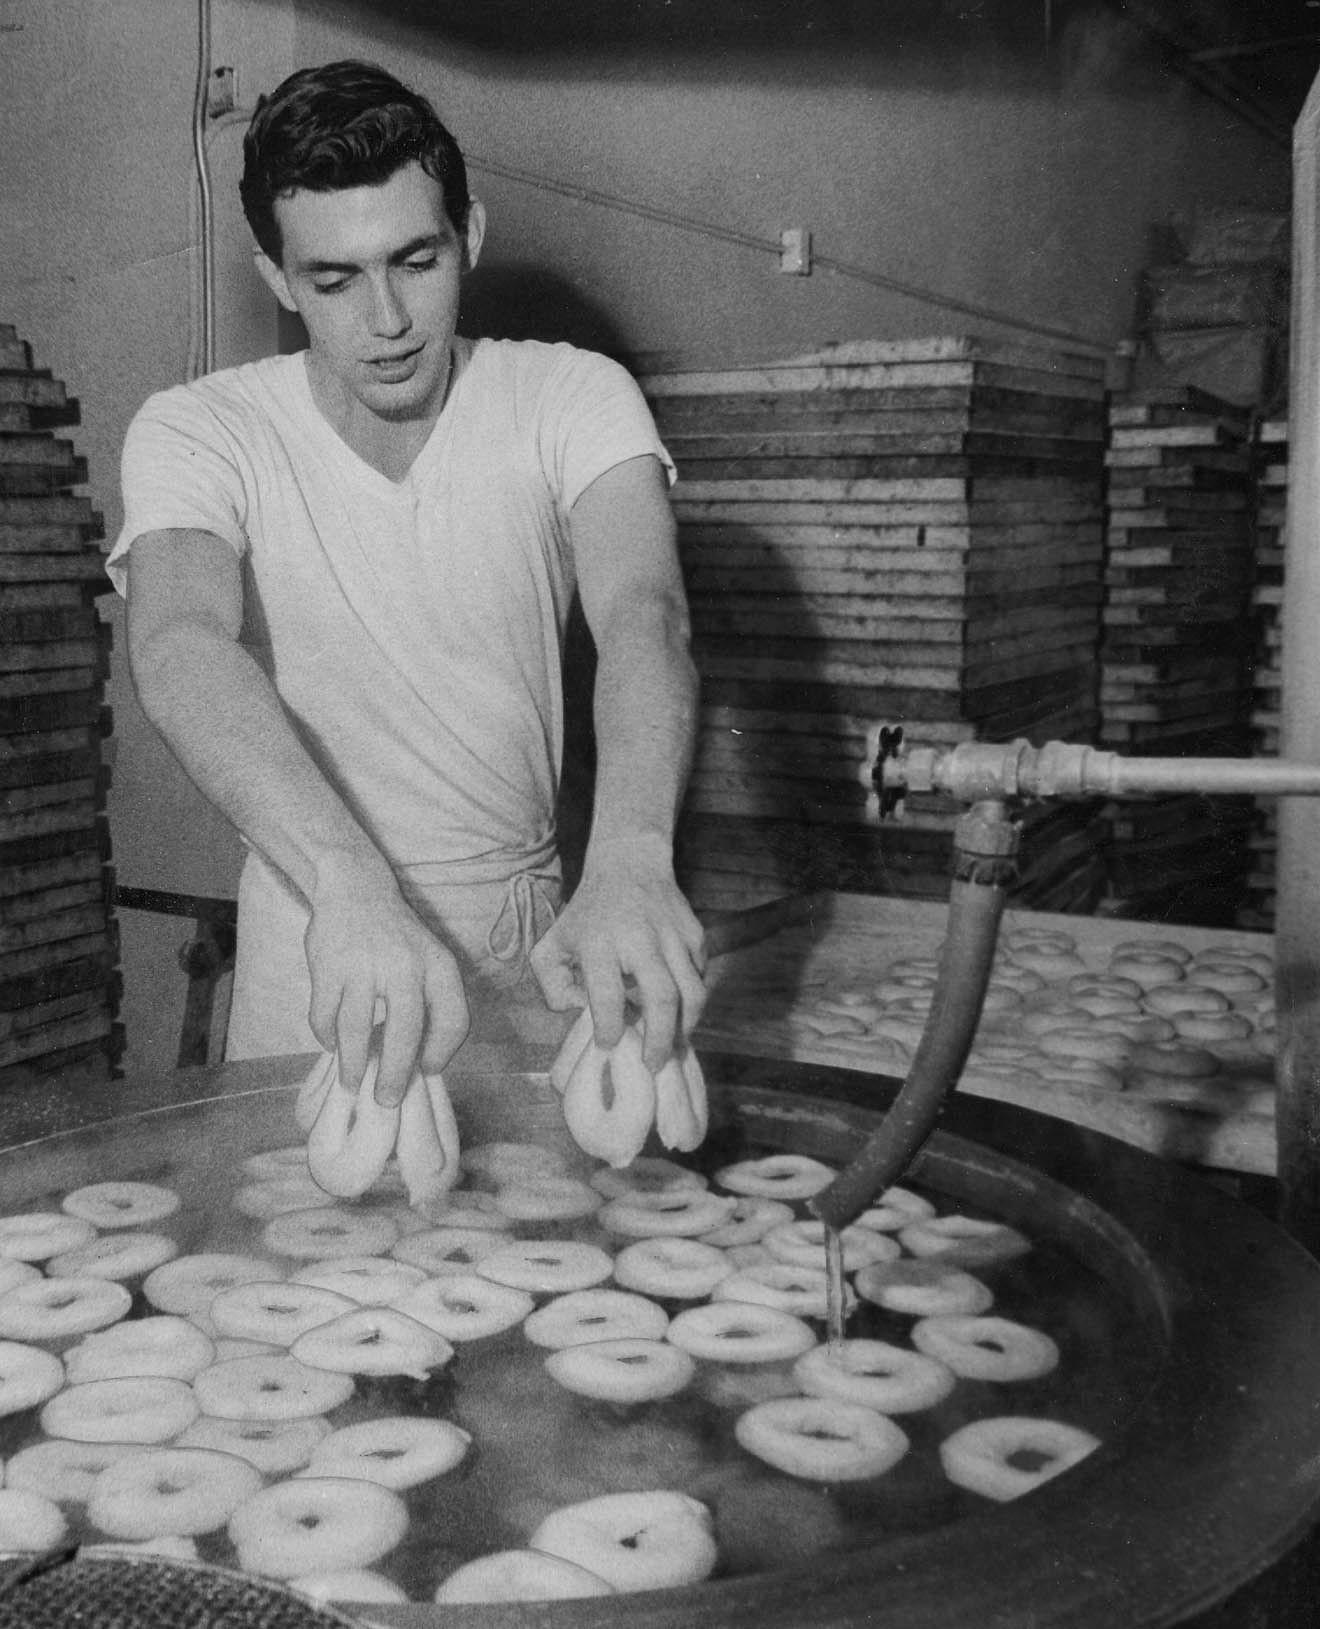 Пекарь готовит бейглы. Нью-Йорк, 1964 год © James O'Rourke / Newsday RM via Getty Images